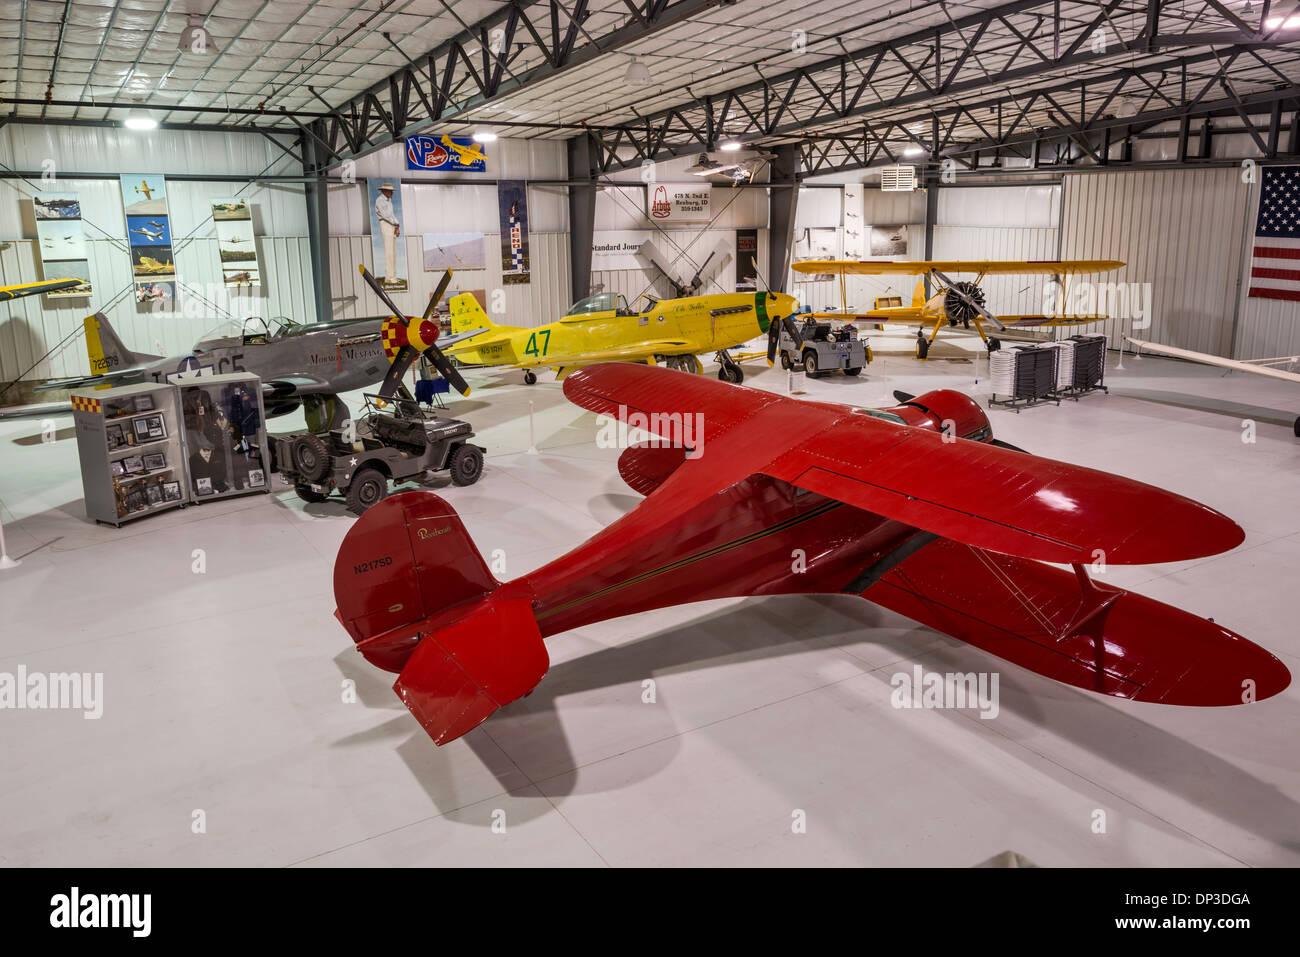 Beechcraft Model 17 Staggerwing, 1930s US corporate biplane aircraft, Legacy Flight Museum, Rexburg, Idaho, USA - Stock Image